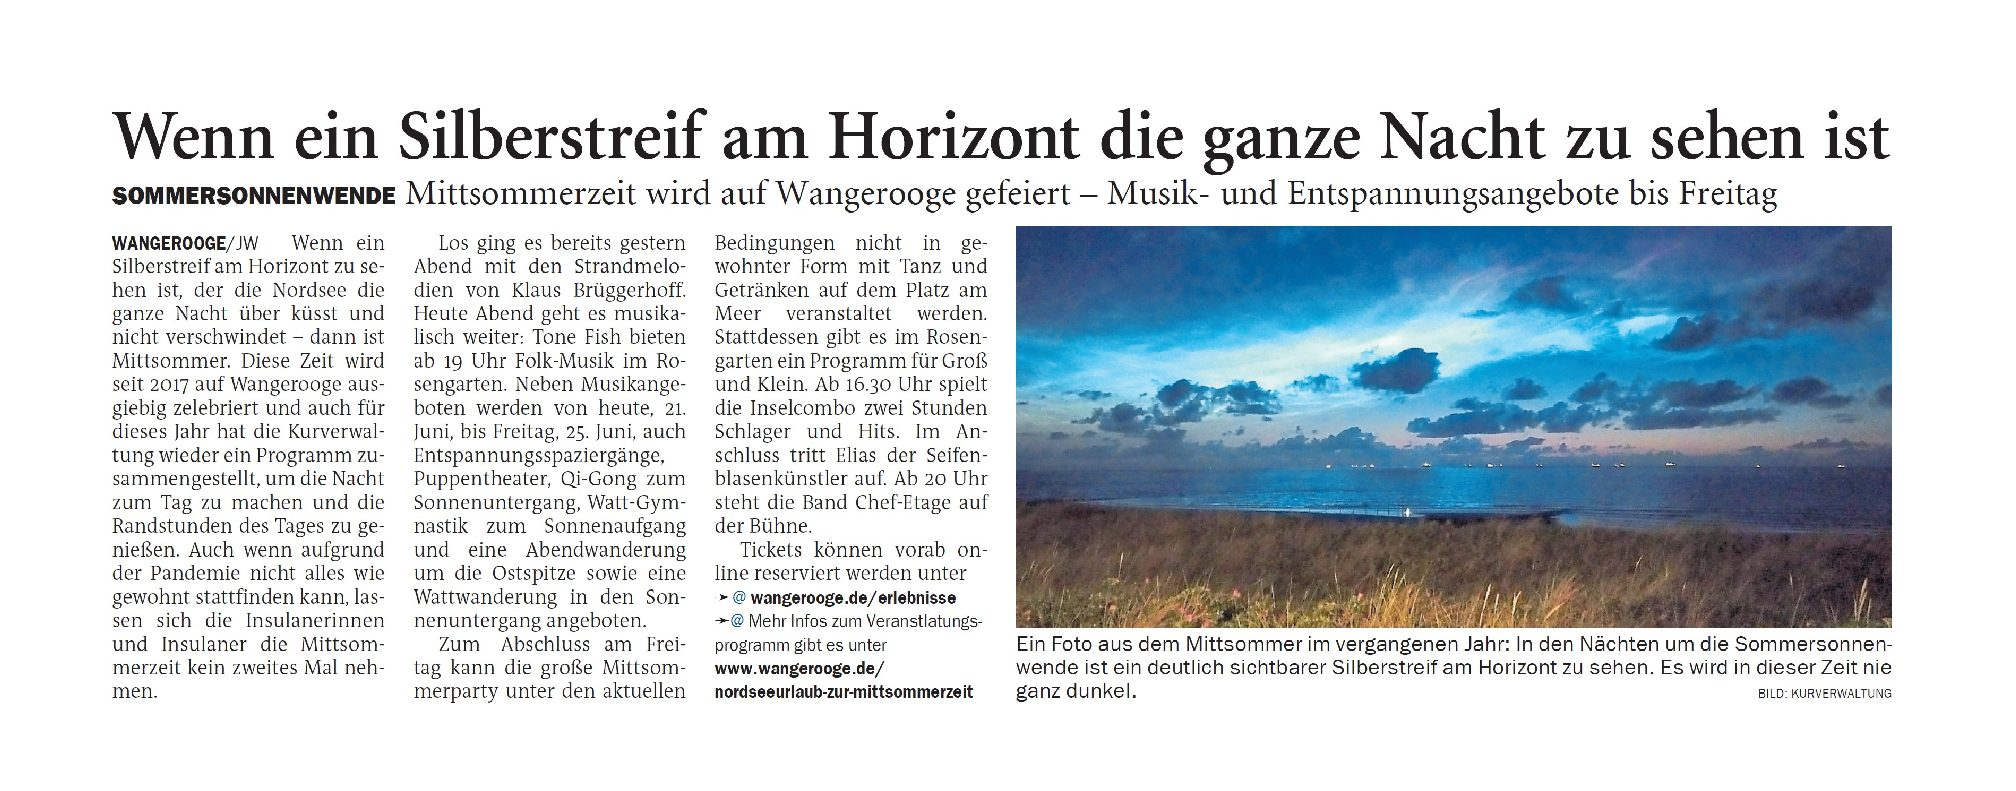 Jeversches Wochenblatt 21.06.2021 III